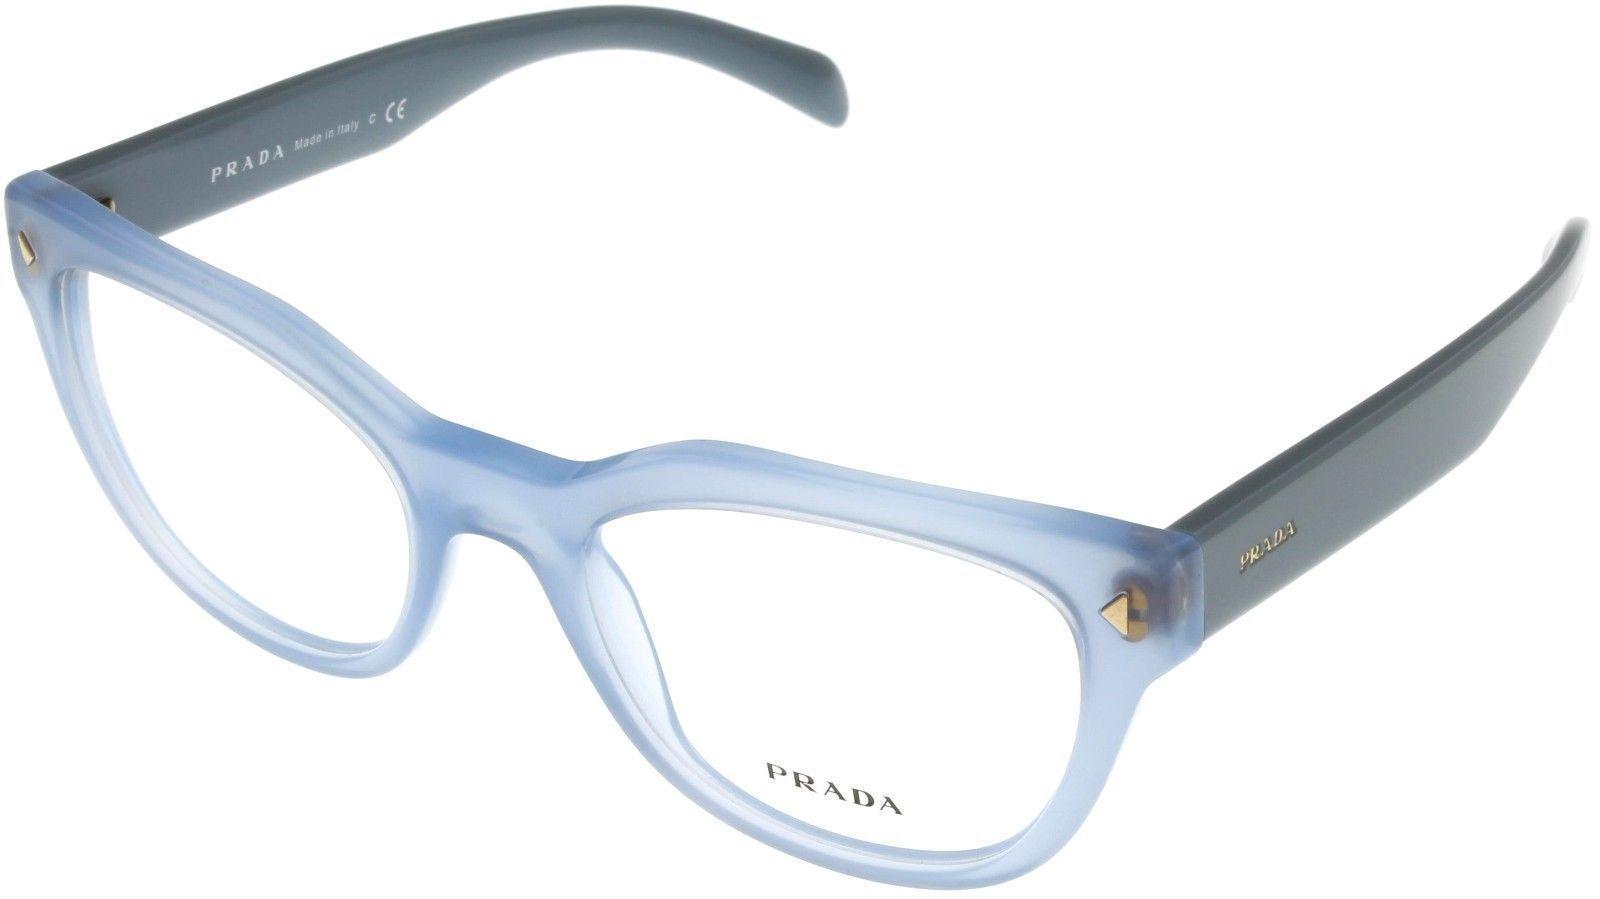 3e18a57a850 Prada Eyewear Frame Blue Azure Cat Eye Women and 38 similar items